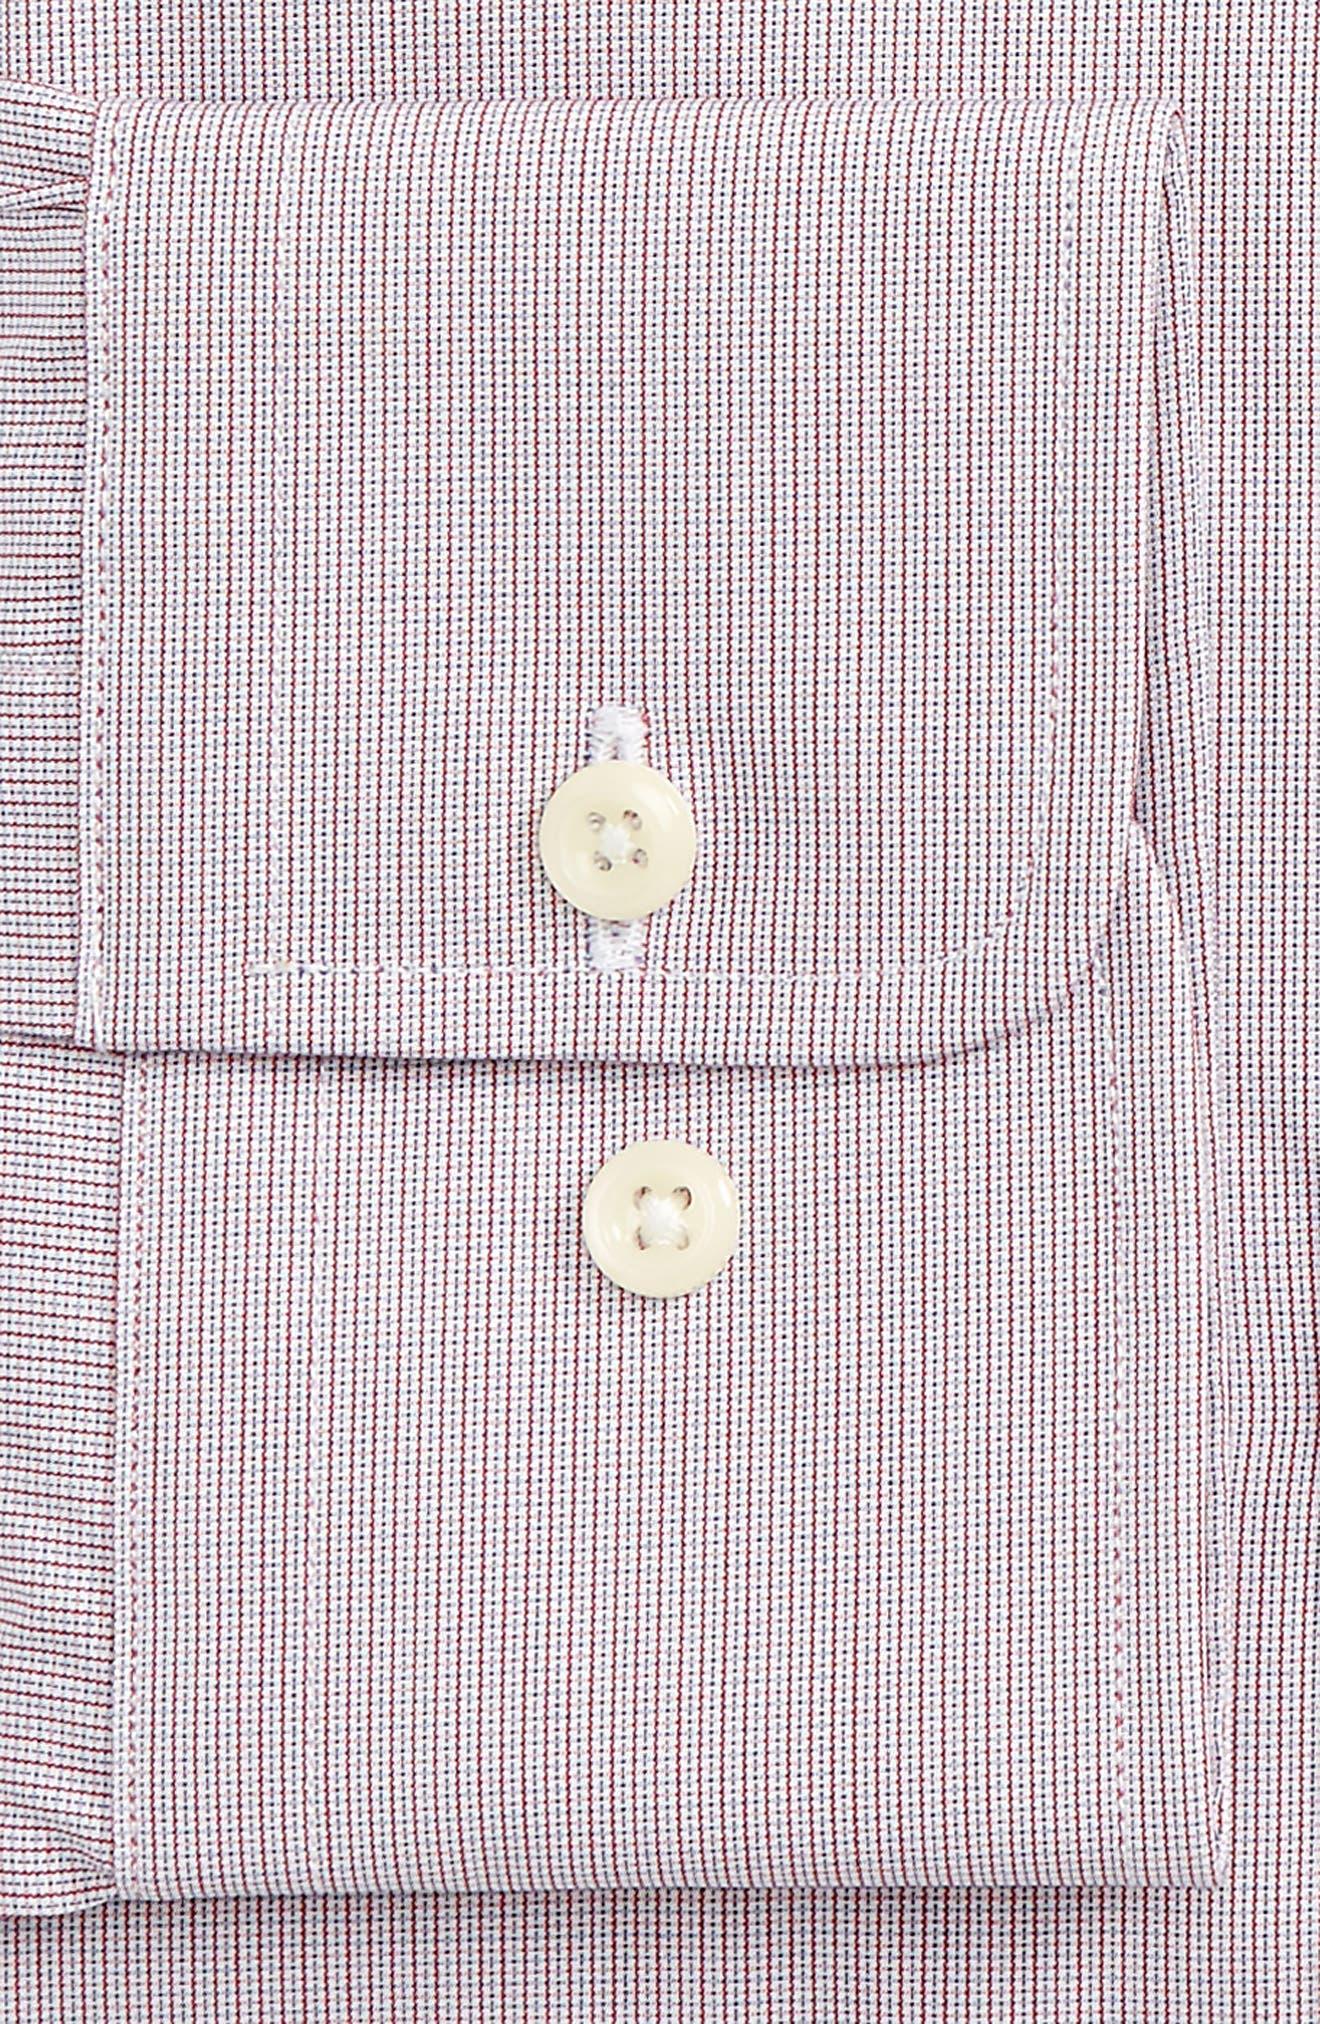 Regular Fit Check Dress Shirt,                             Alternate thumbnail 2, color,                             Merlot